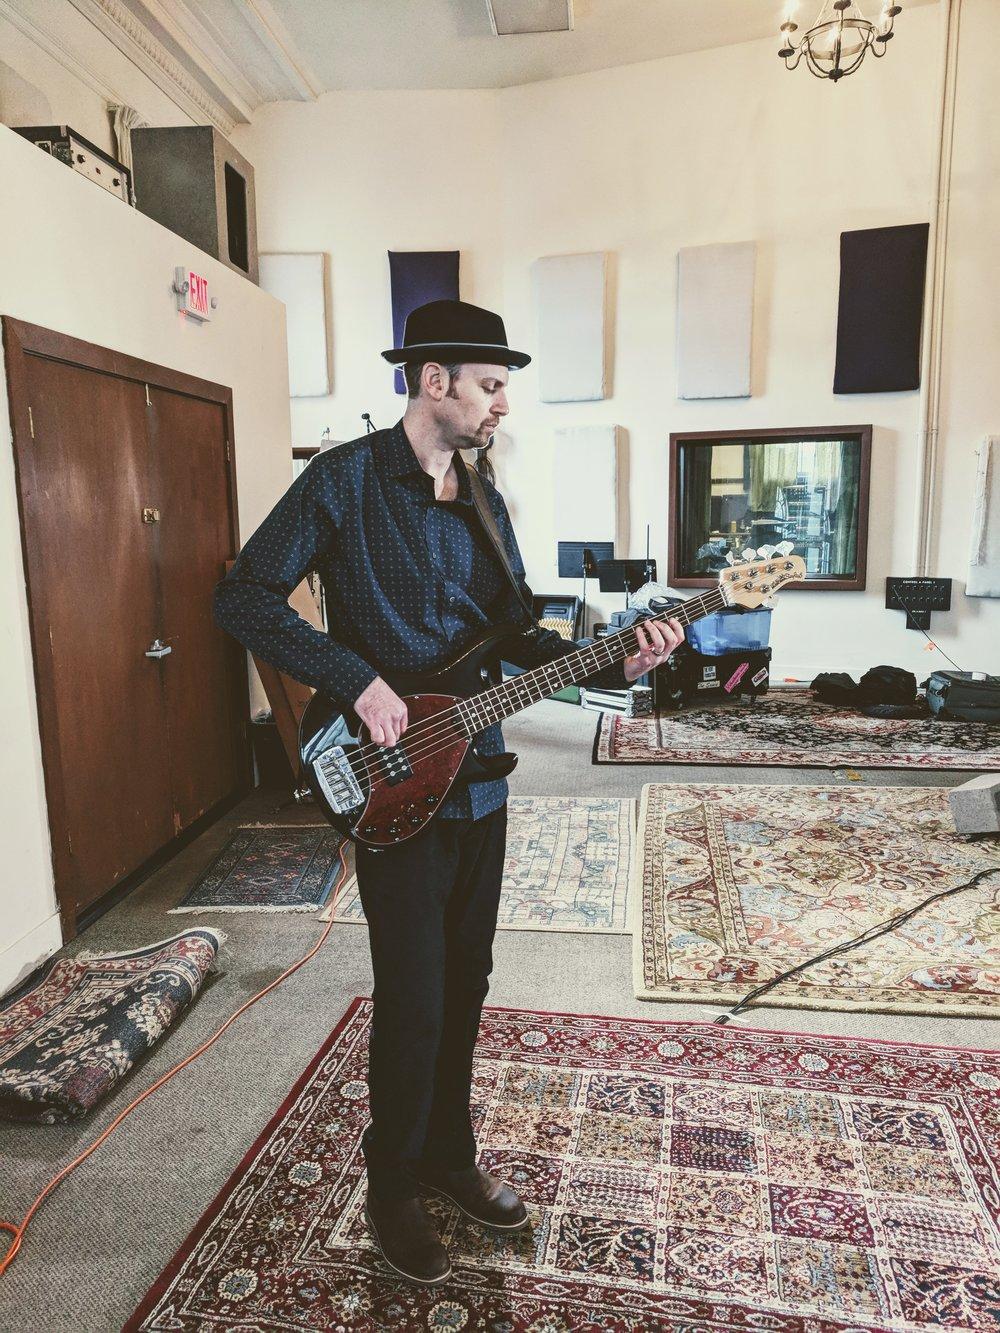 Jordan of Sharlet Crooks playing at the Hallowed Halls